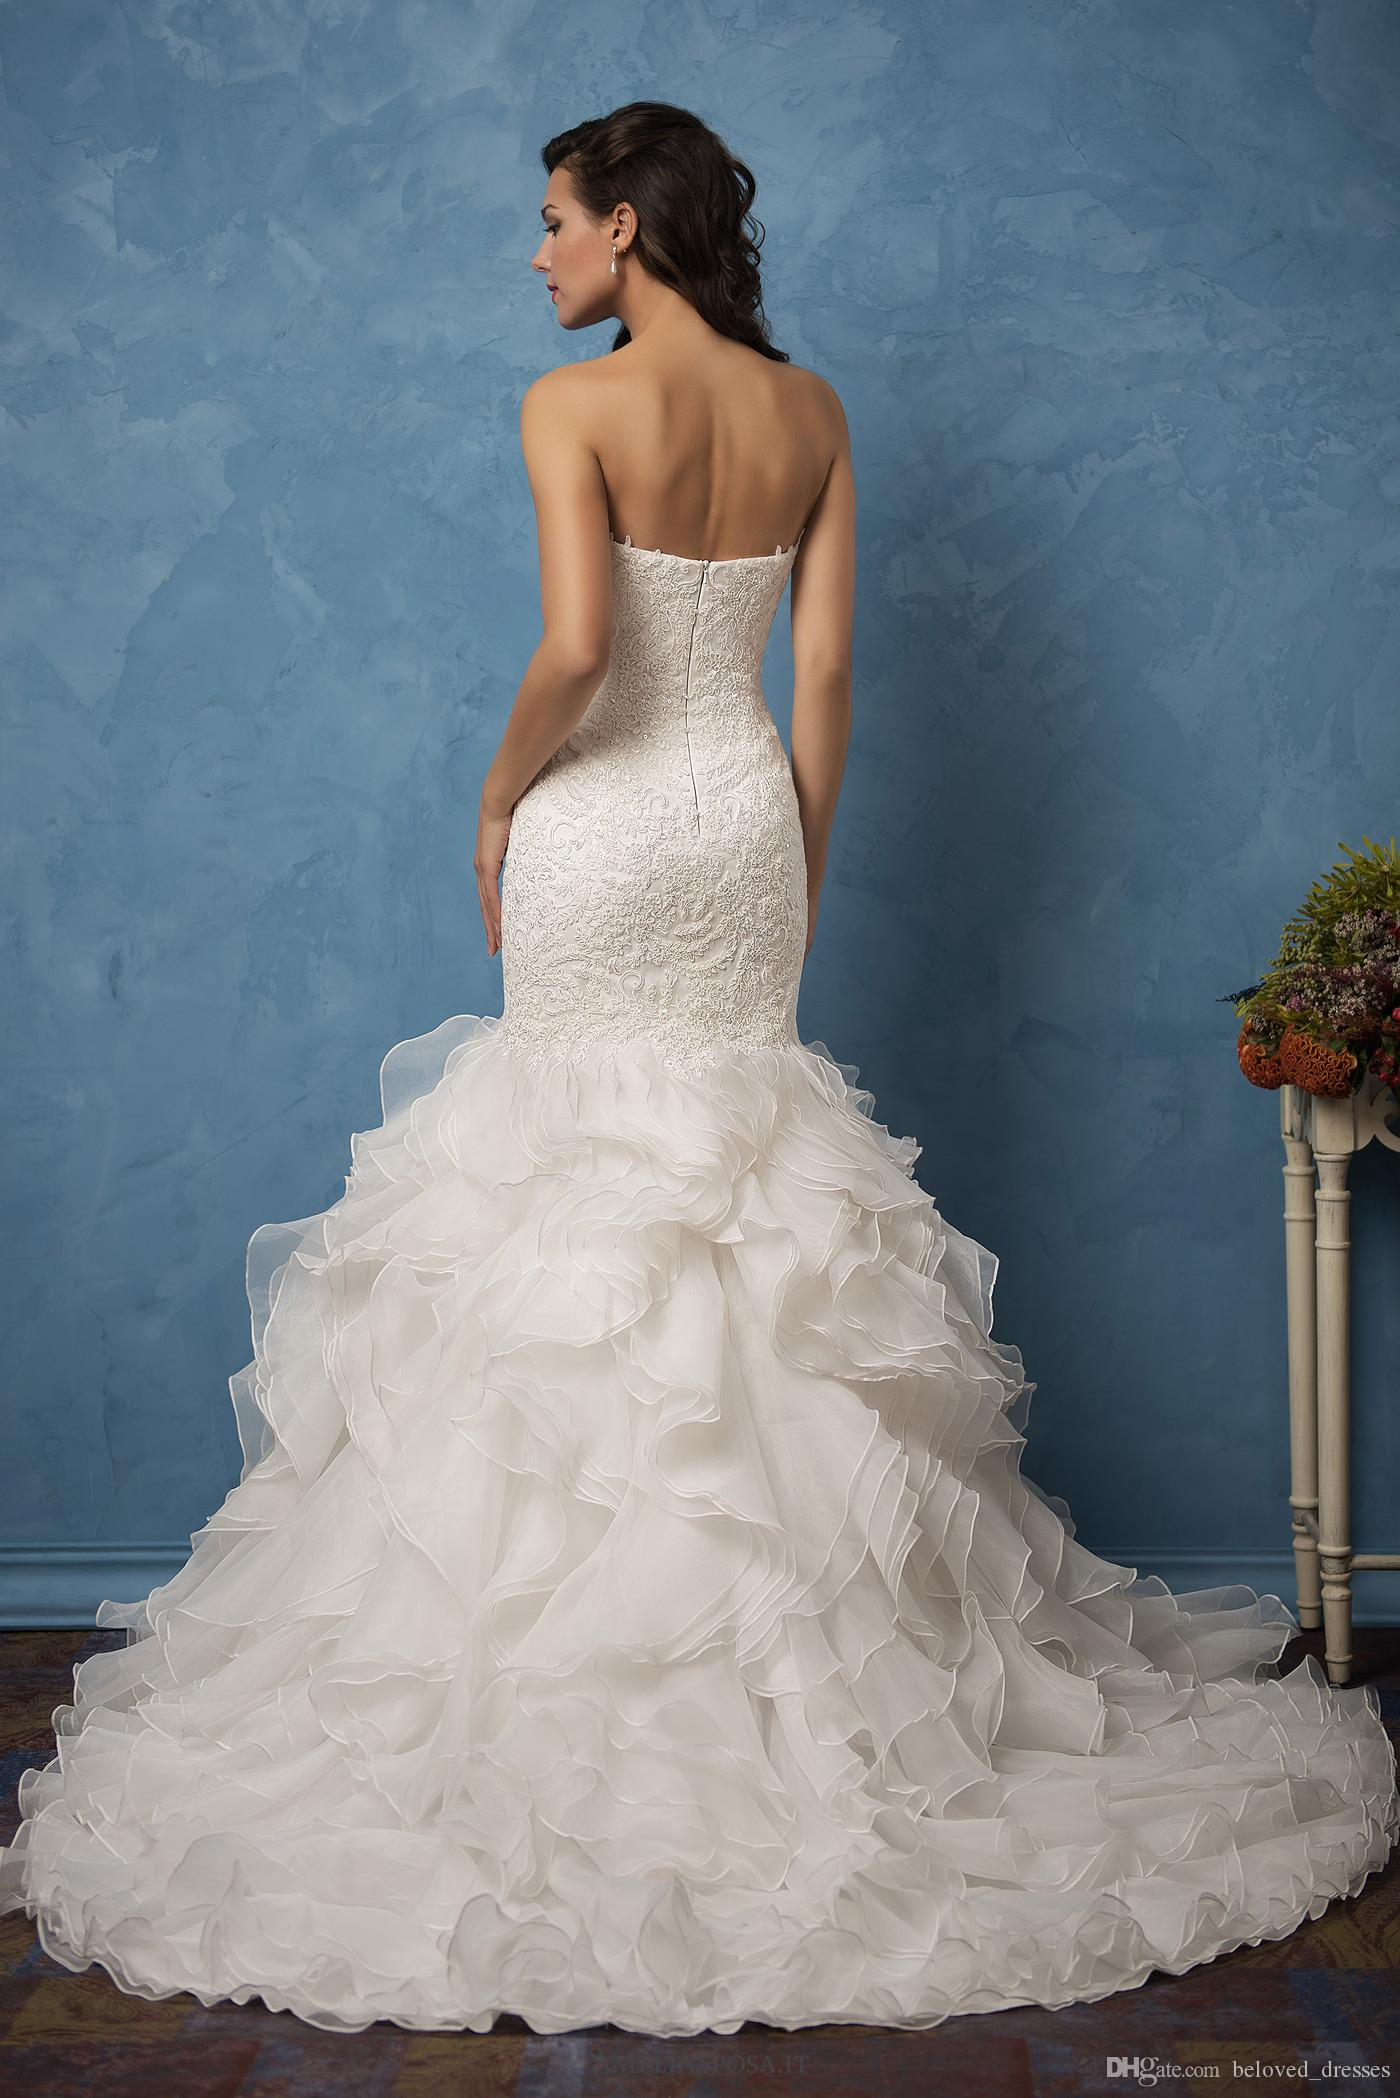 Modern Wedding Dresses Spokane Wa Gallery - All Wedding Dresses ...